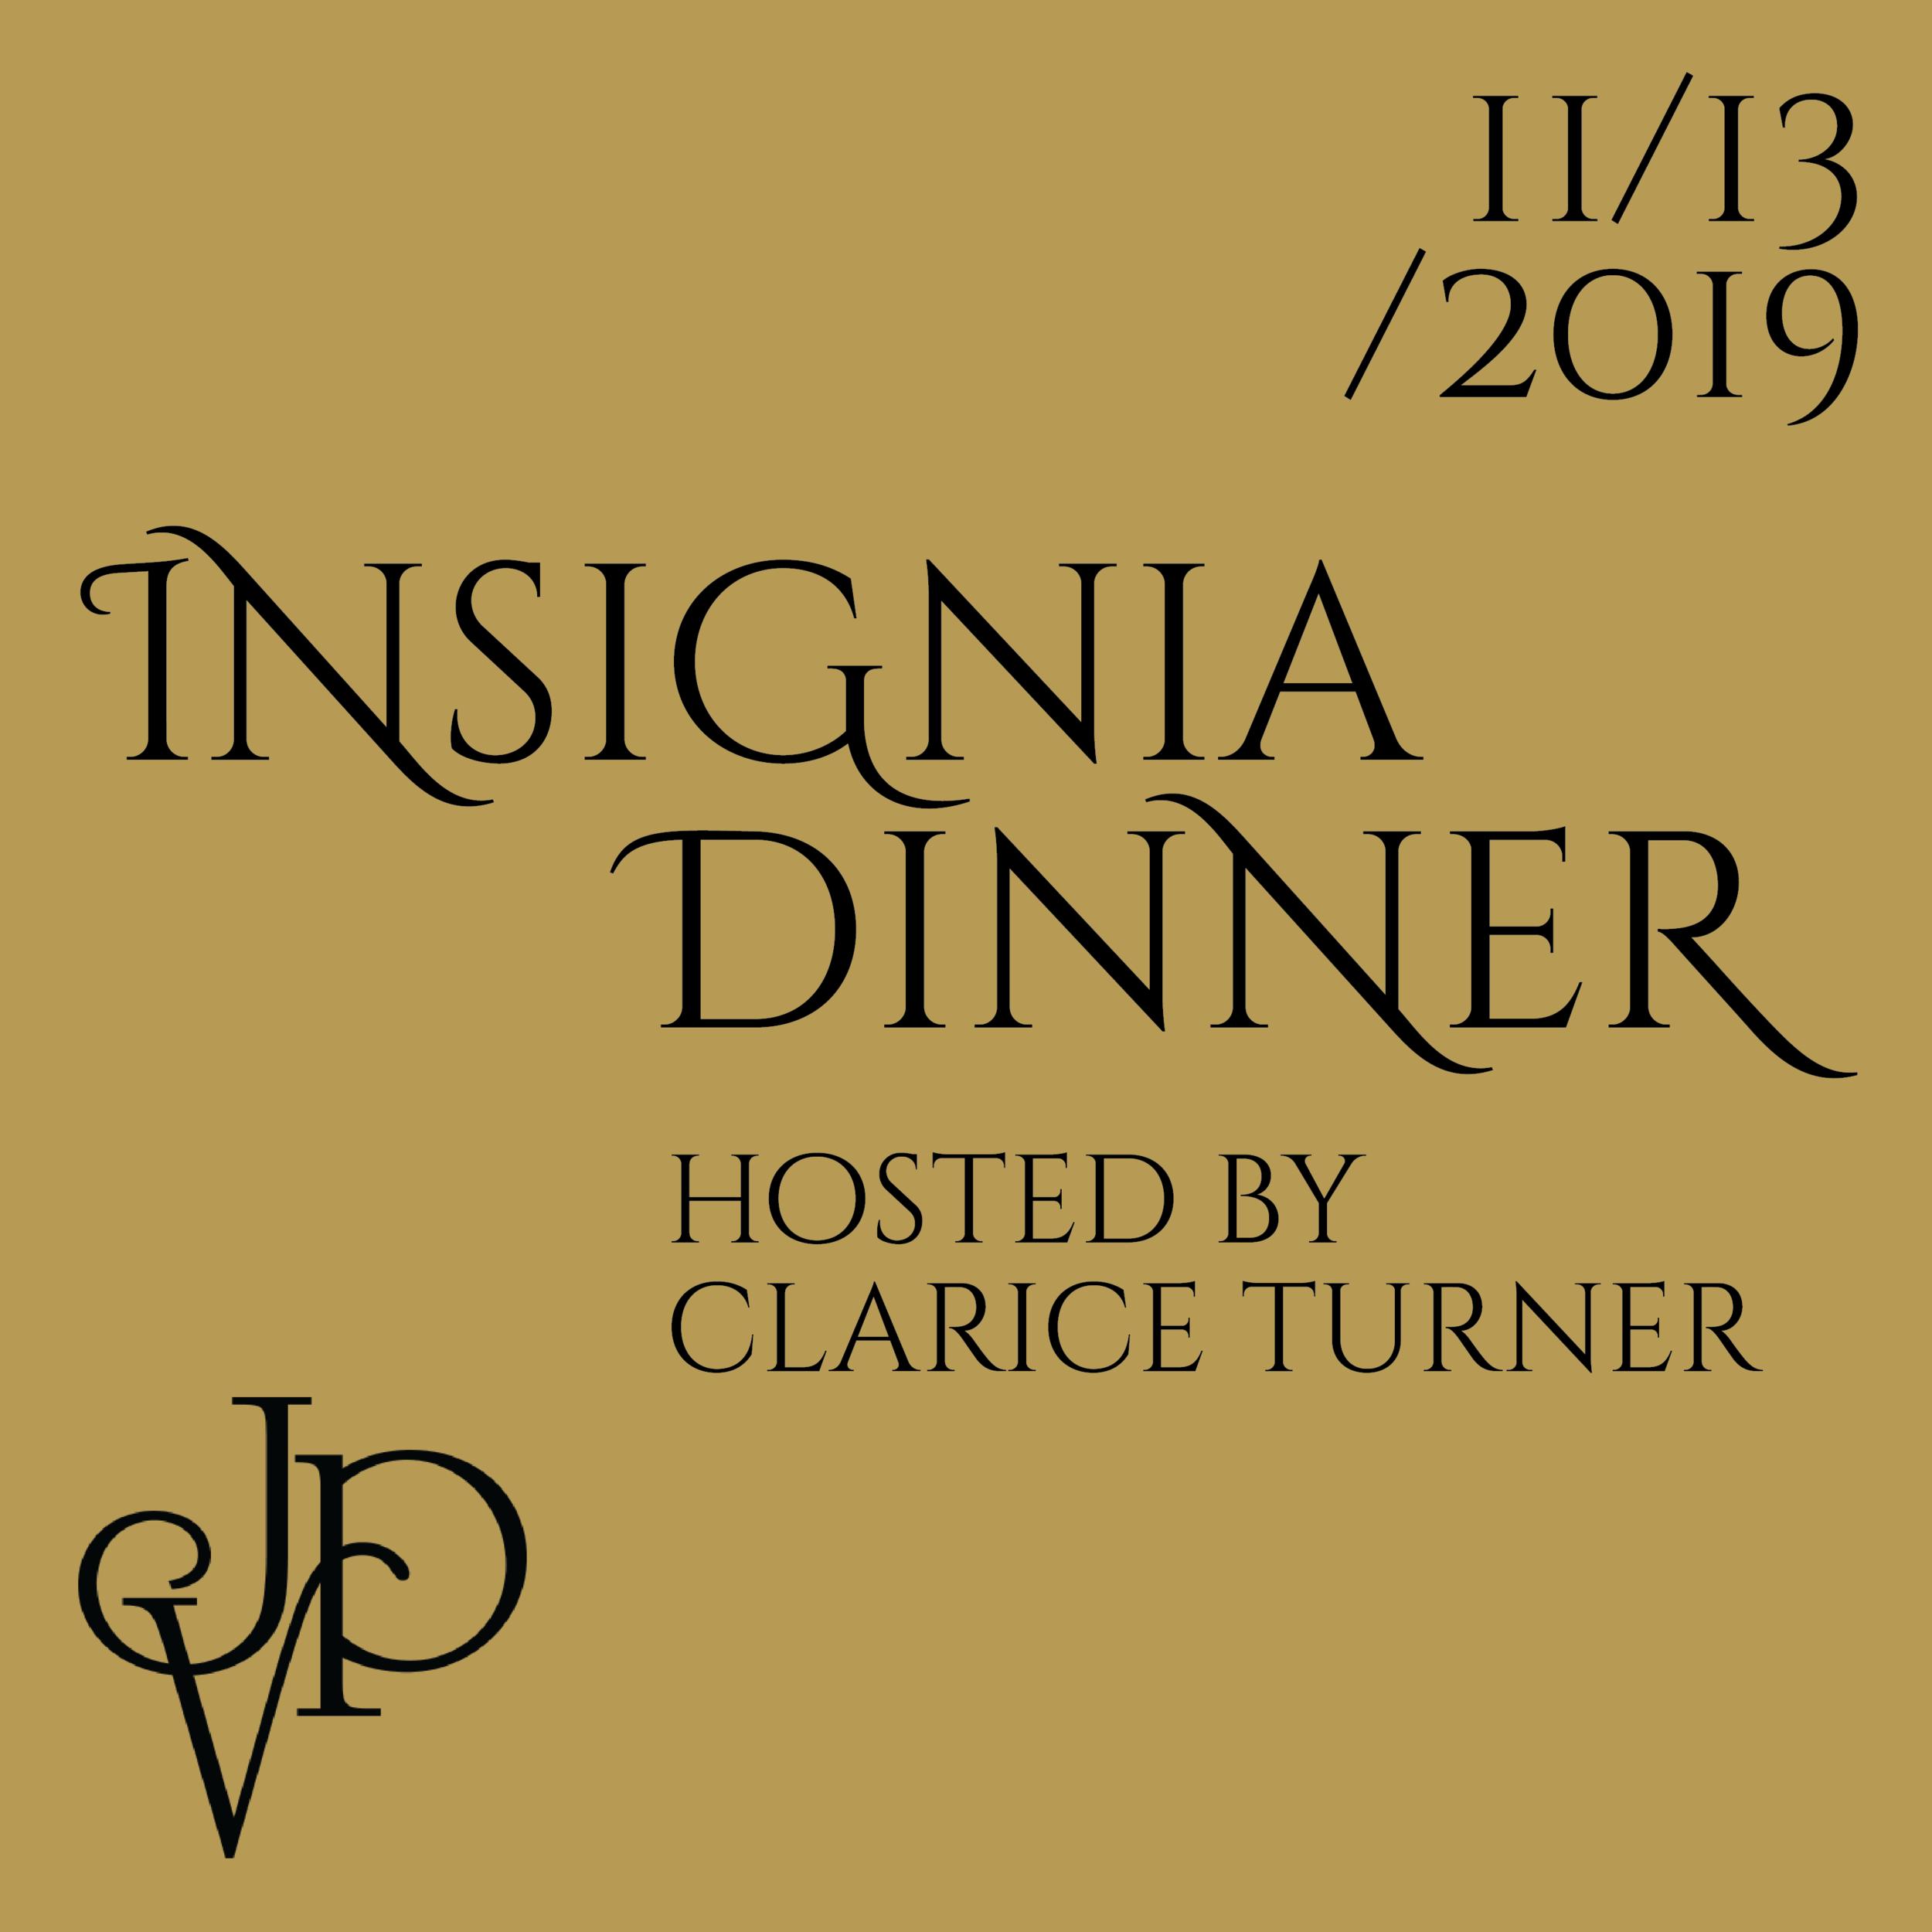 Joseph Phelps' Insignia Dinner The Peninsula Beverly Hills November 13, 2019 TBA